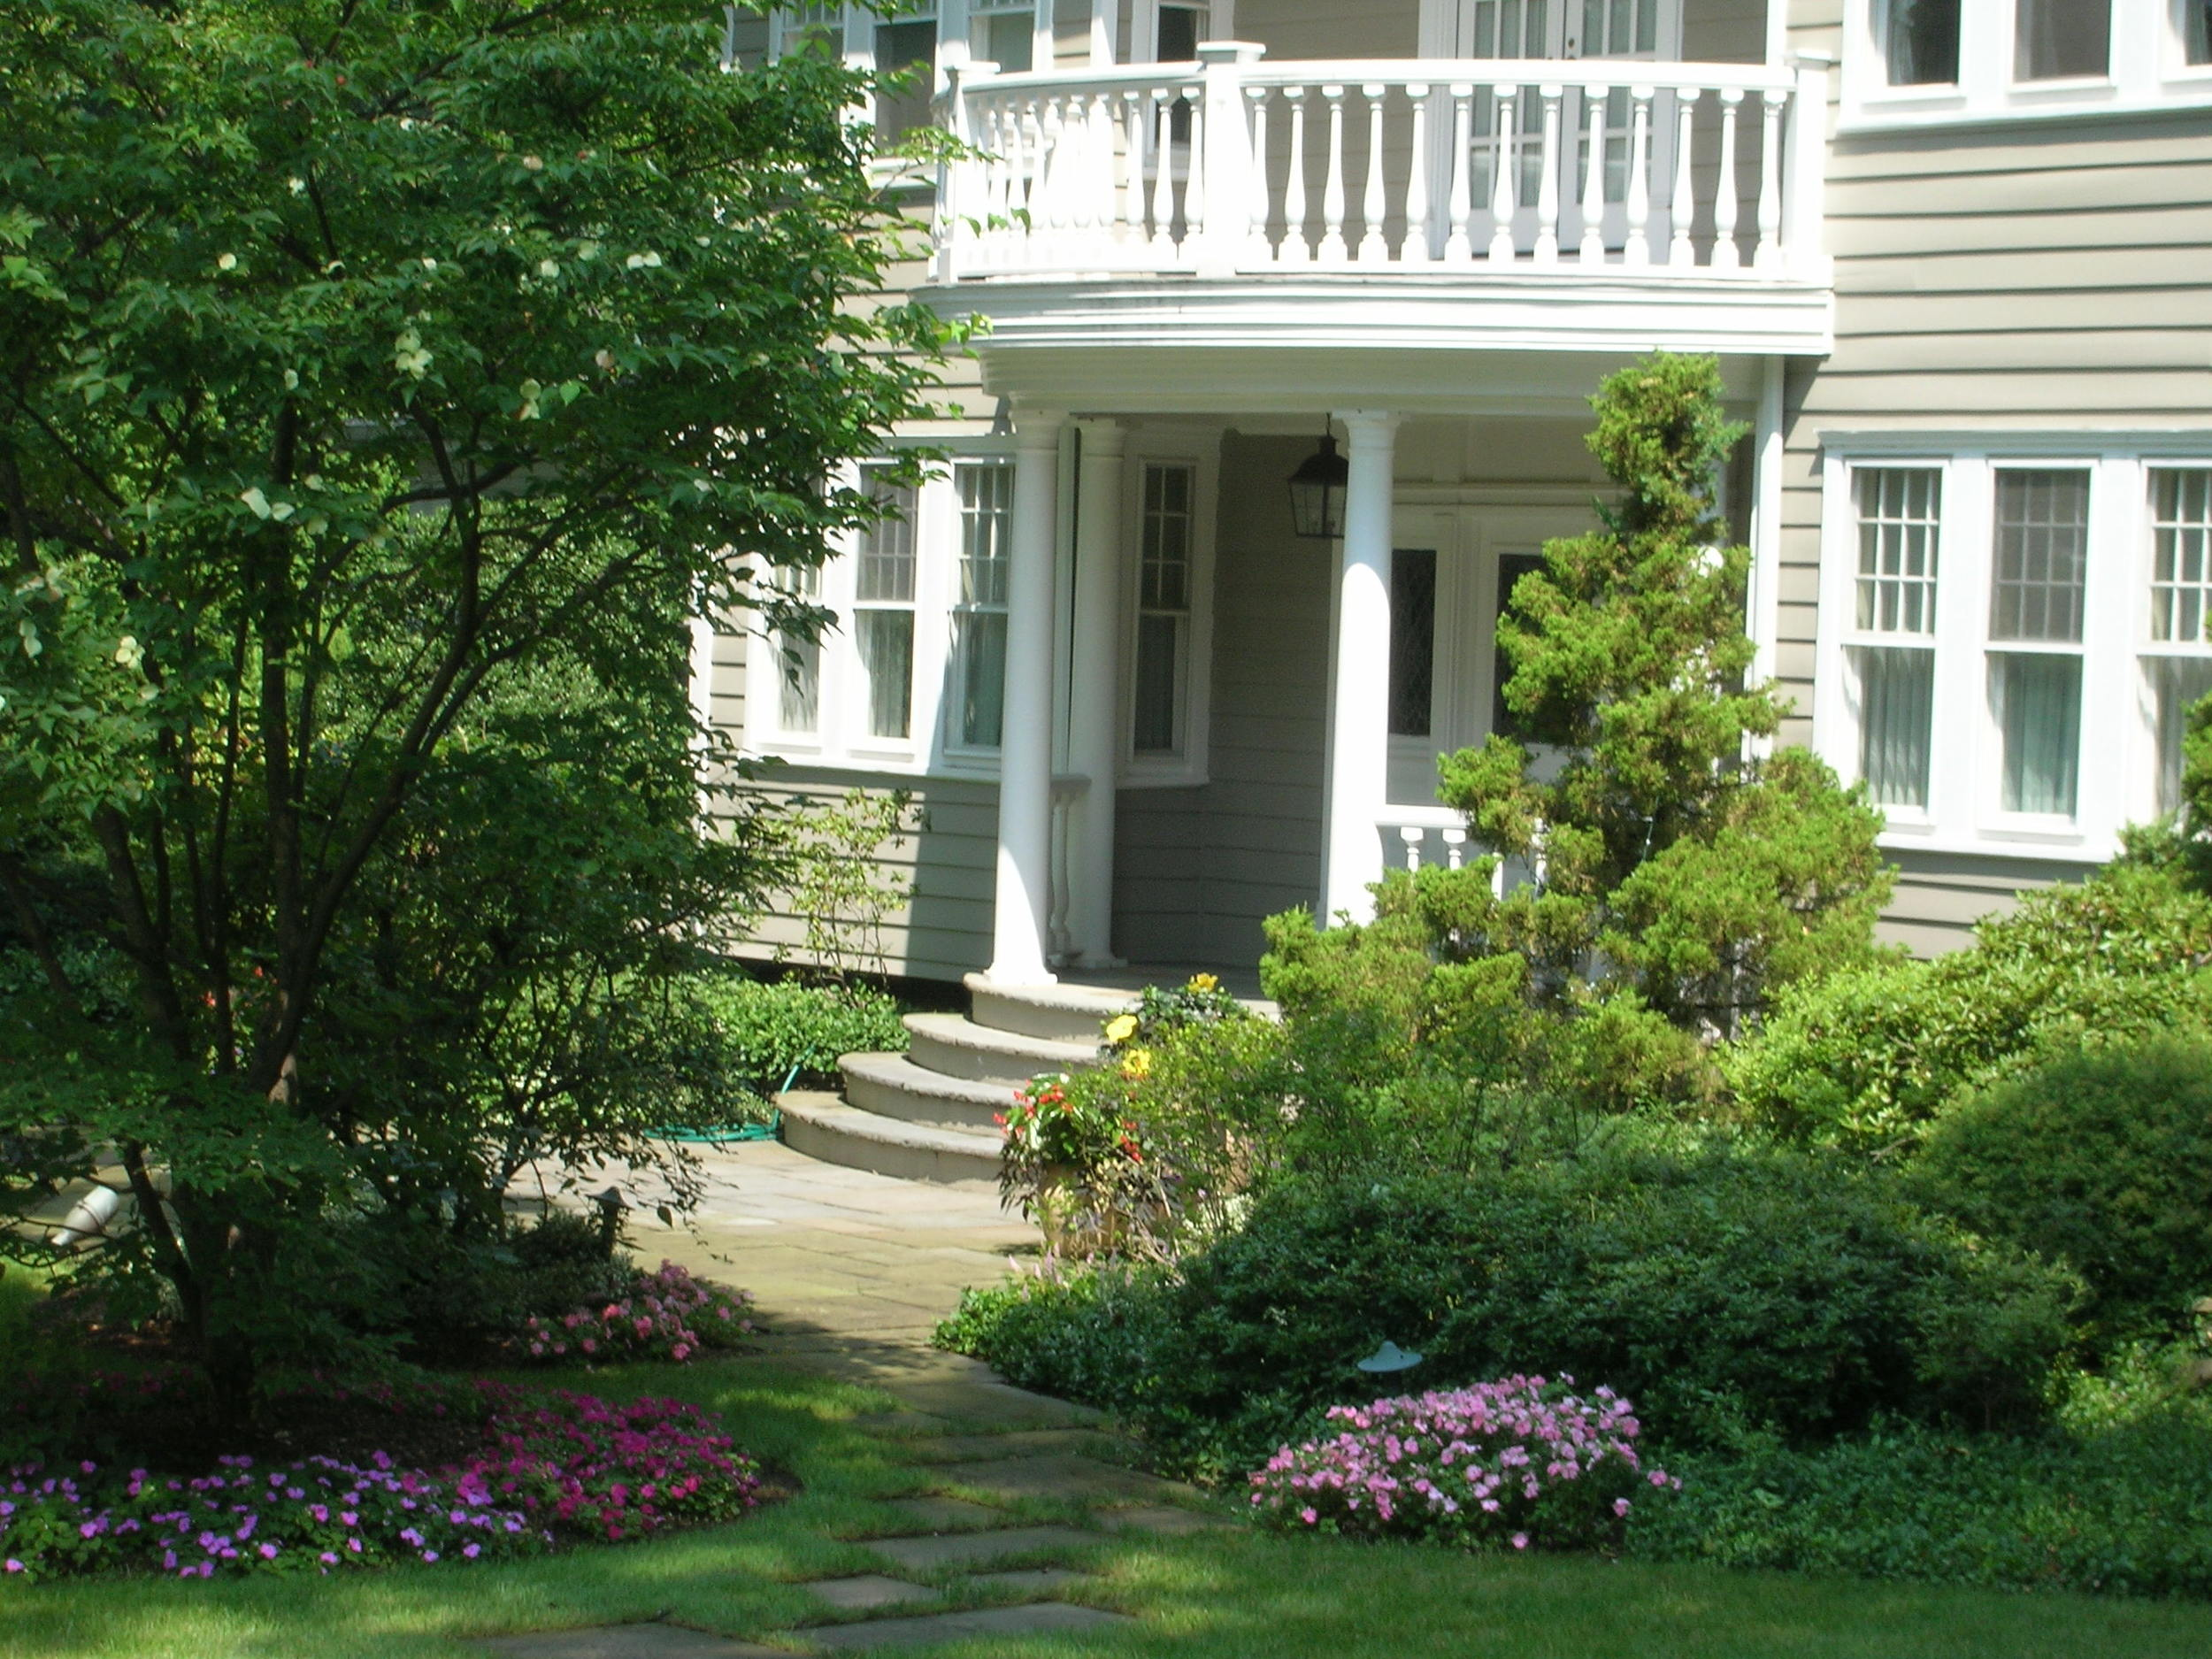 Lawn Mowing Service Ridgewood NJ